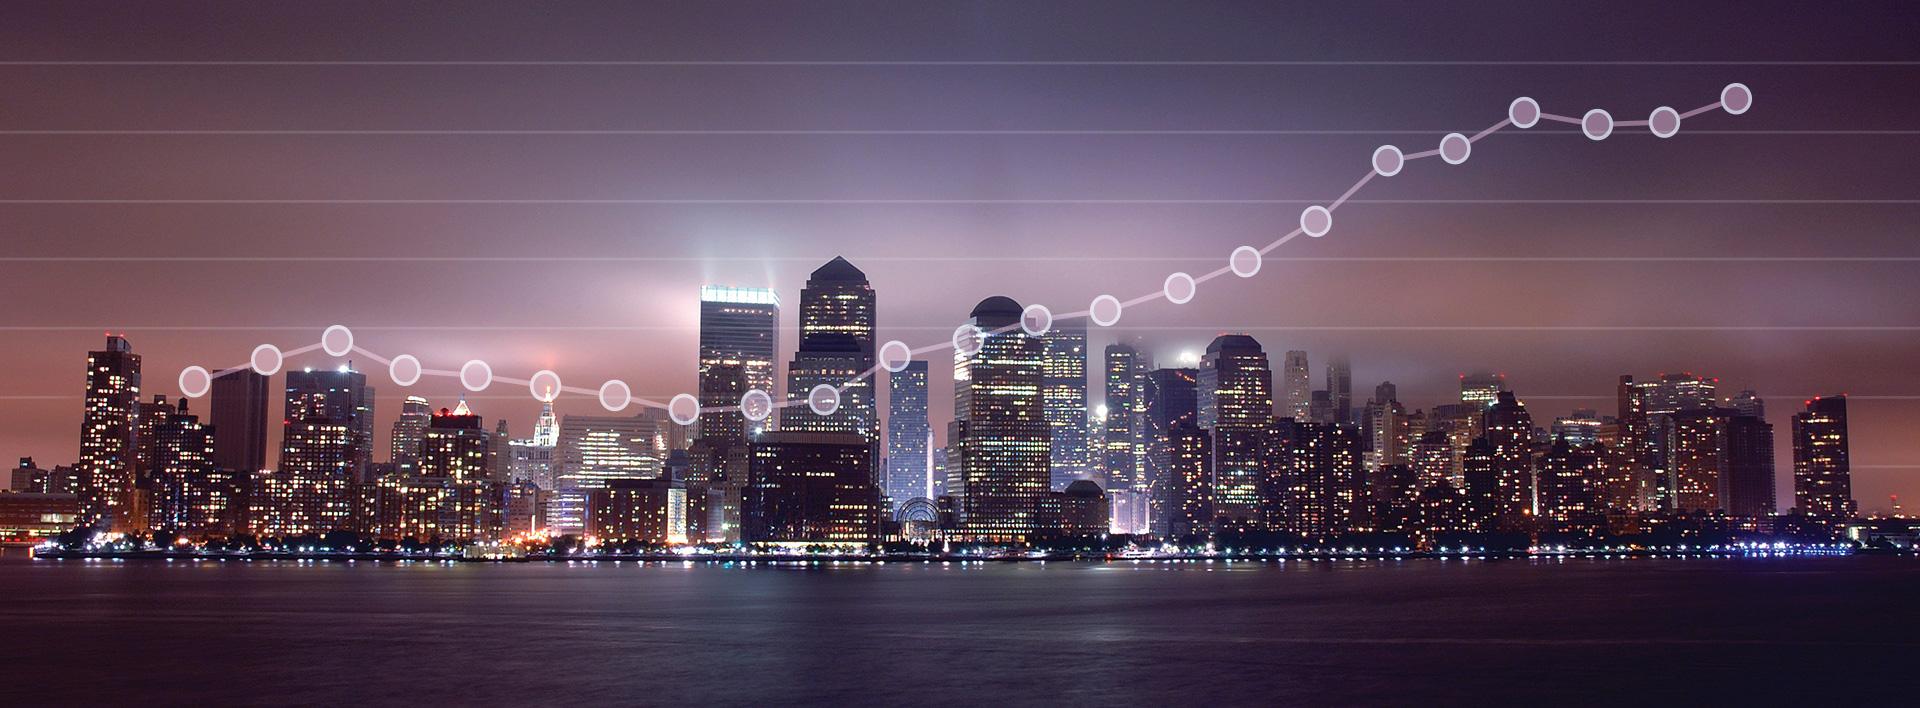 Cityscape banner graphic